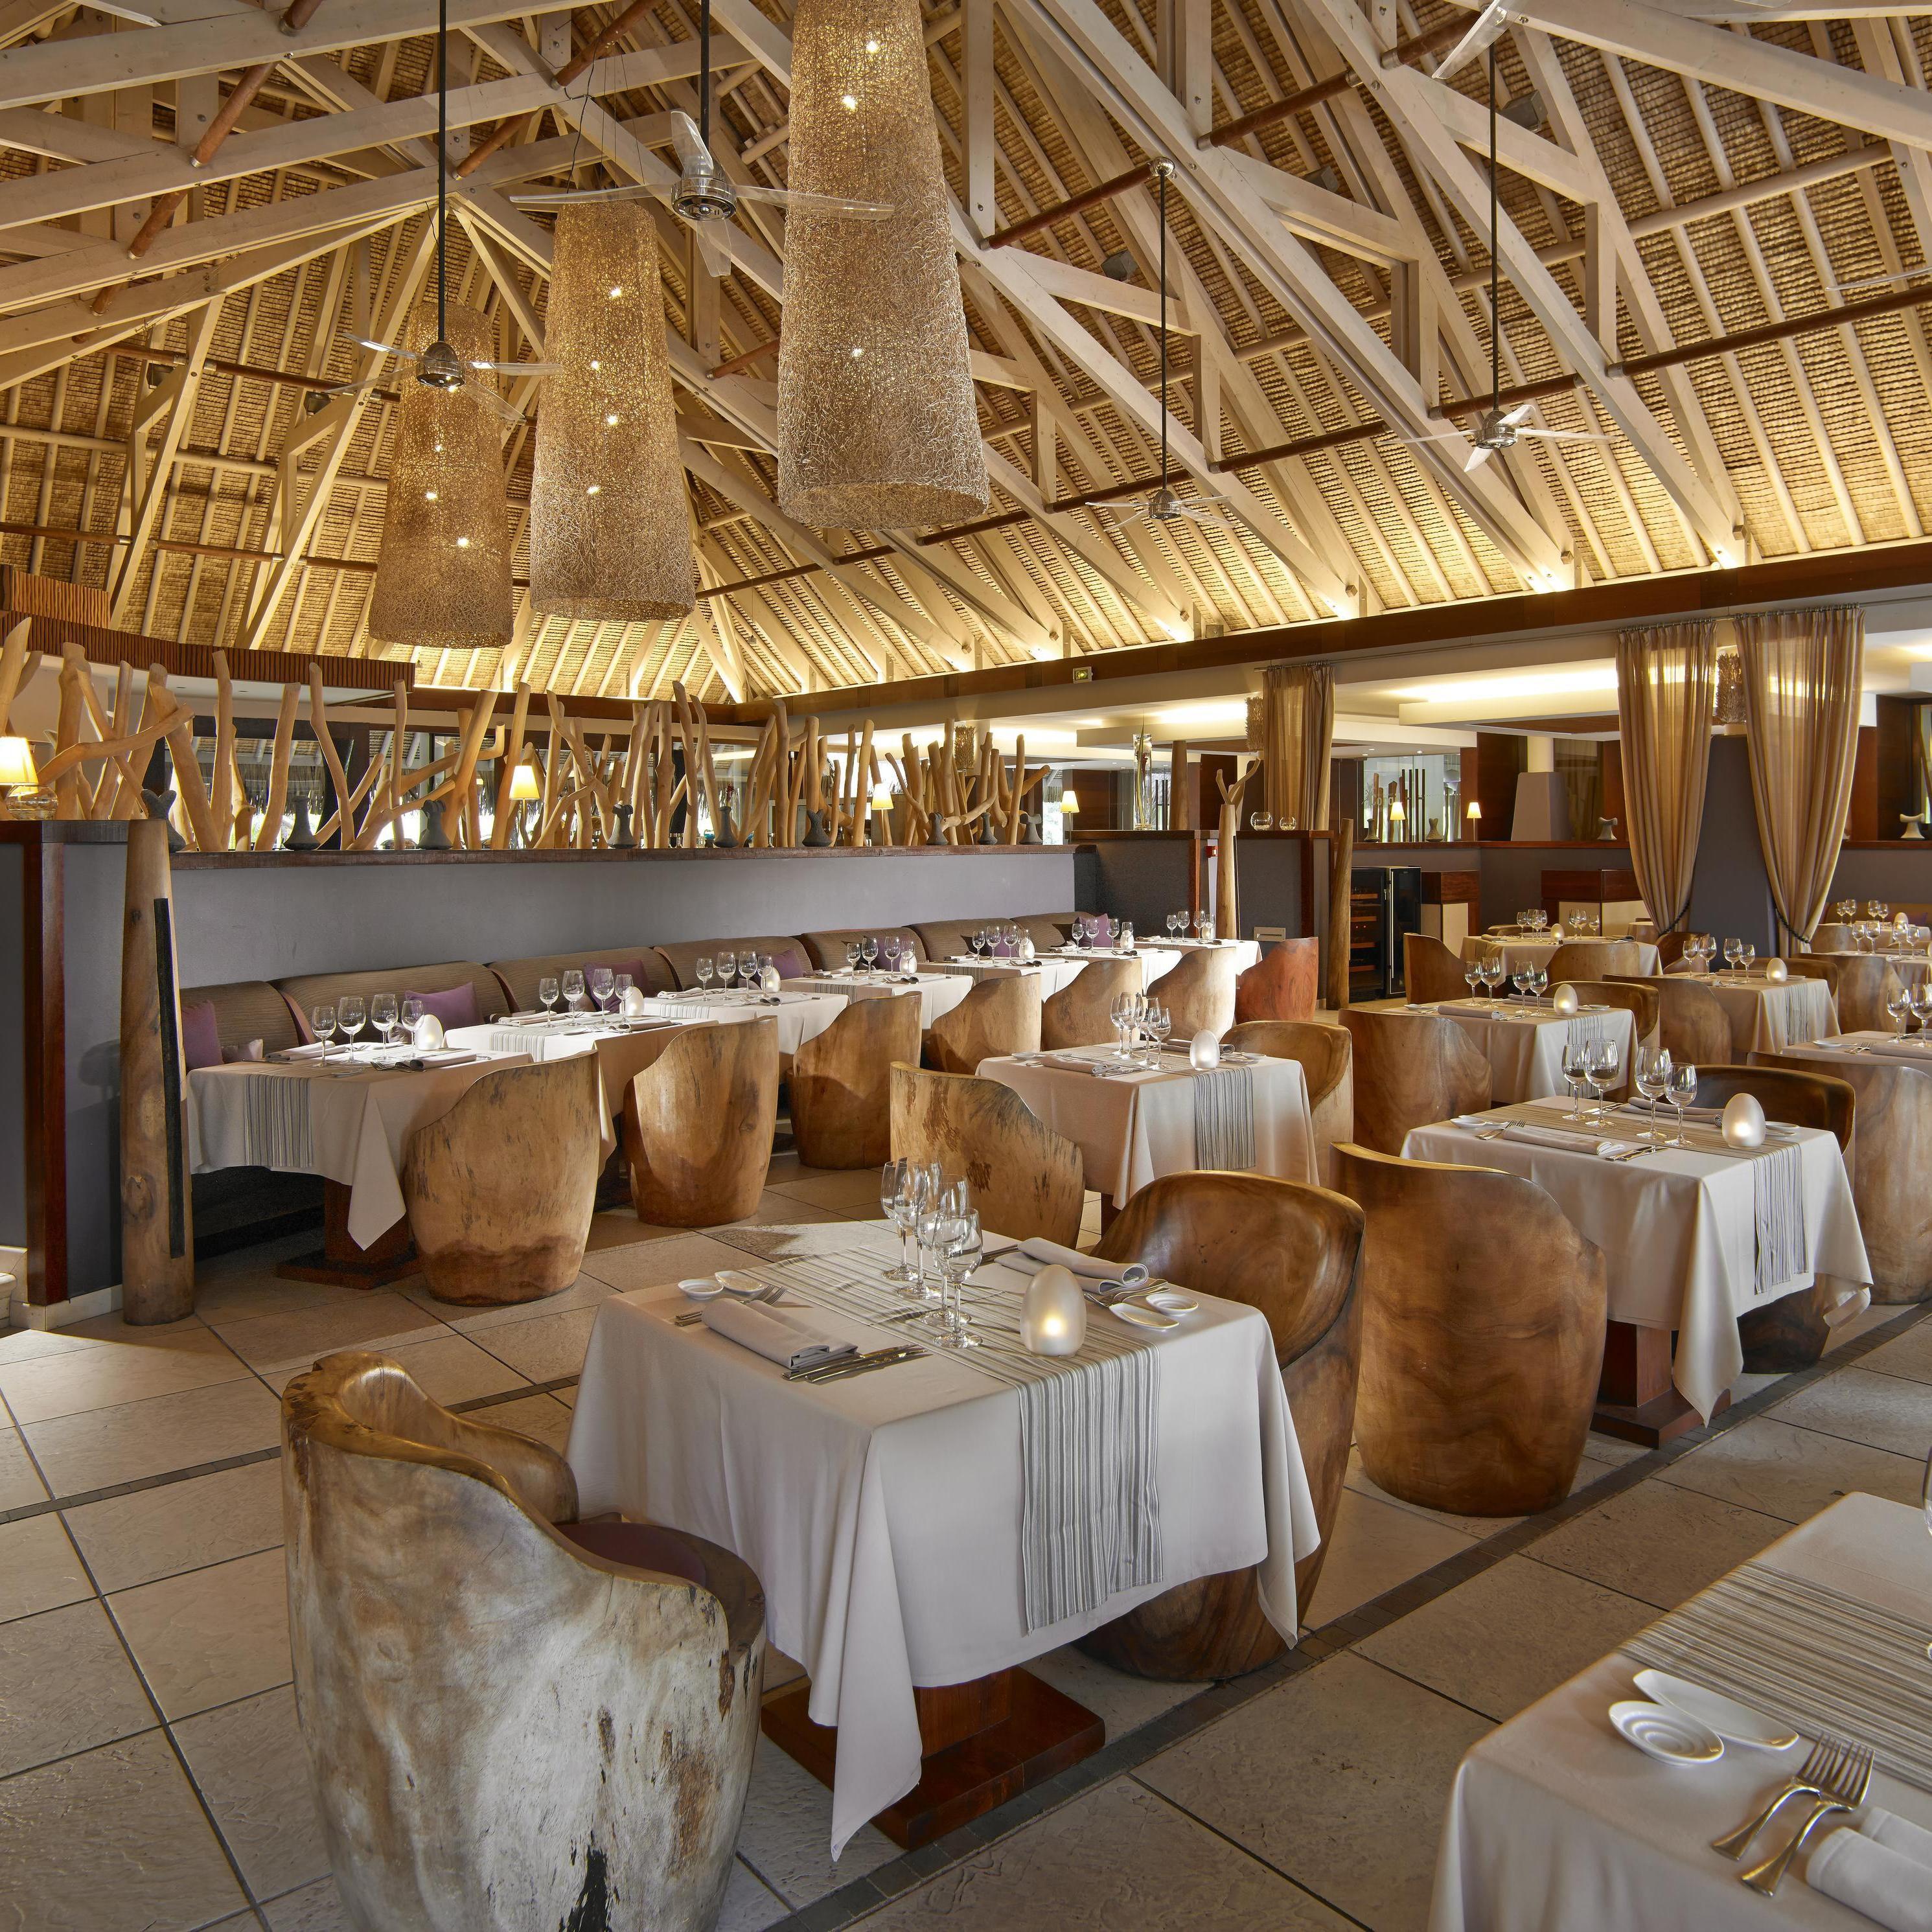 Bora Bora Hotel and Resort InterContinental Thalasso Spa Hotel